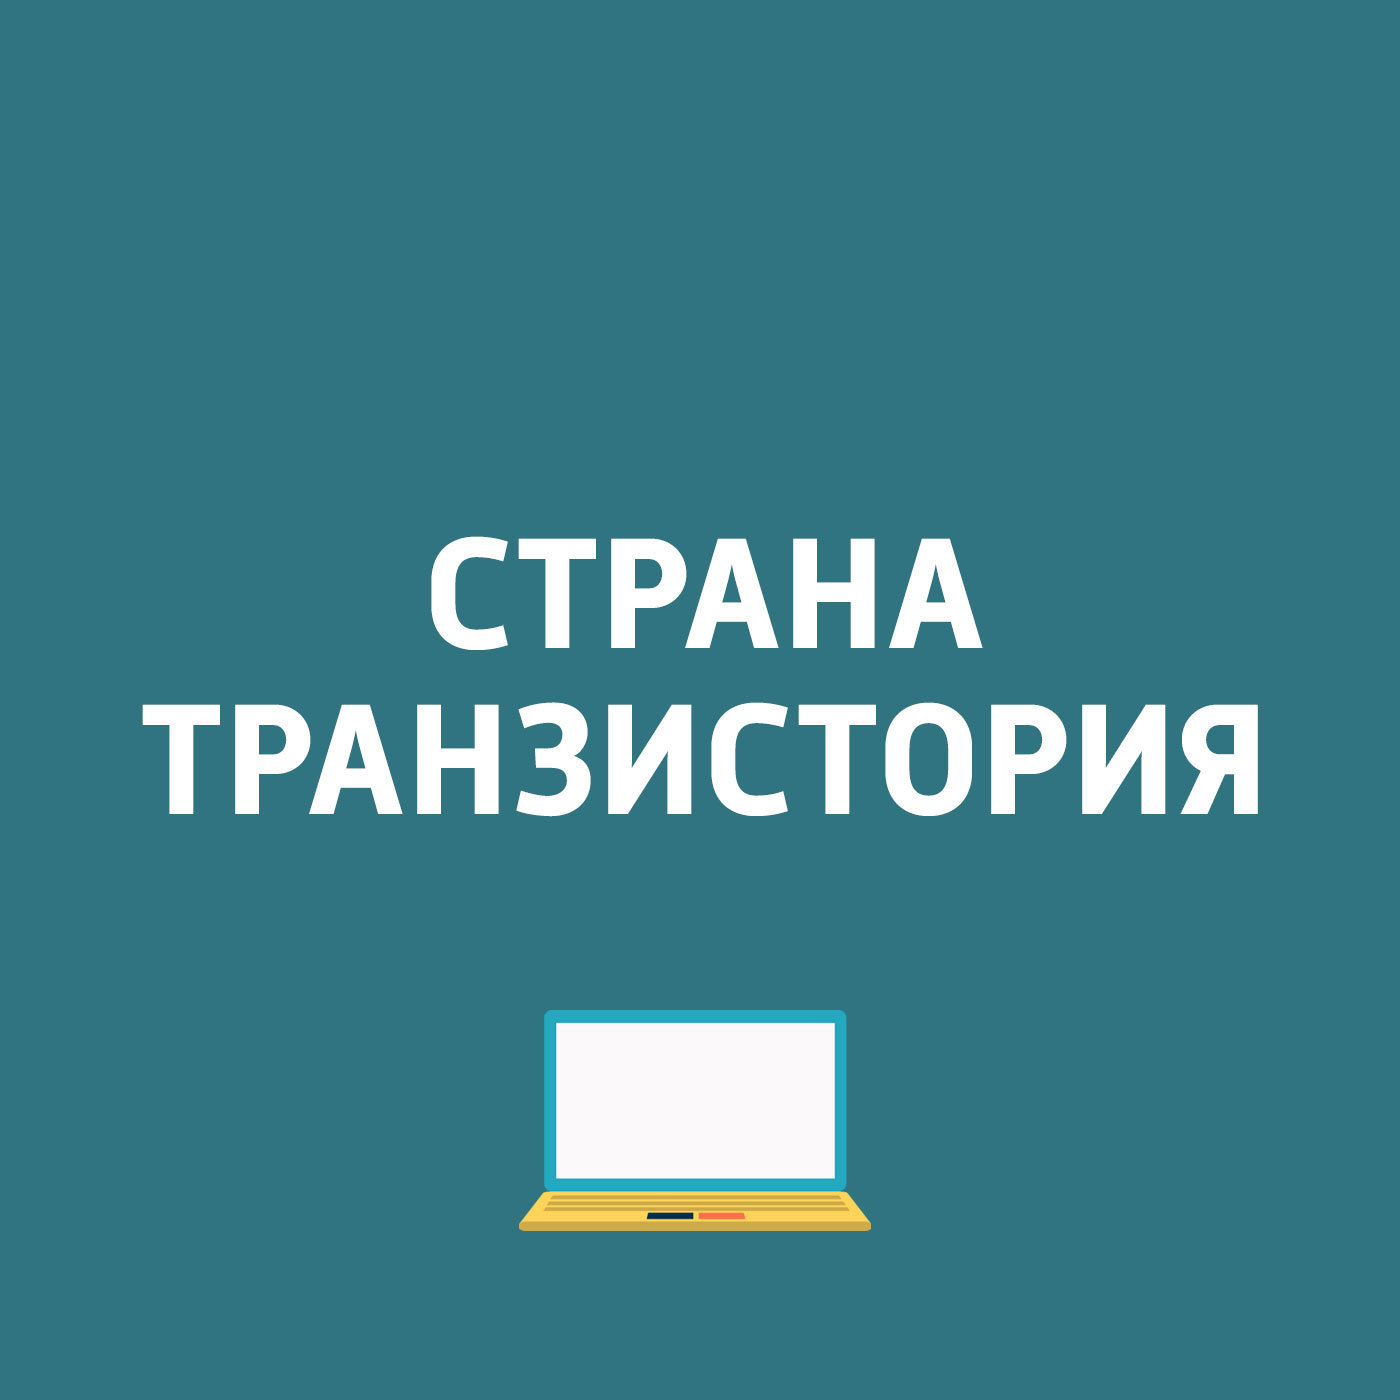 Картаев Павел MediaPad M3 Lite 10; Essential Home... elder scrolls online morrowind ps4